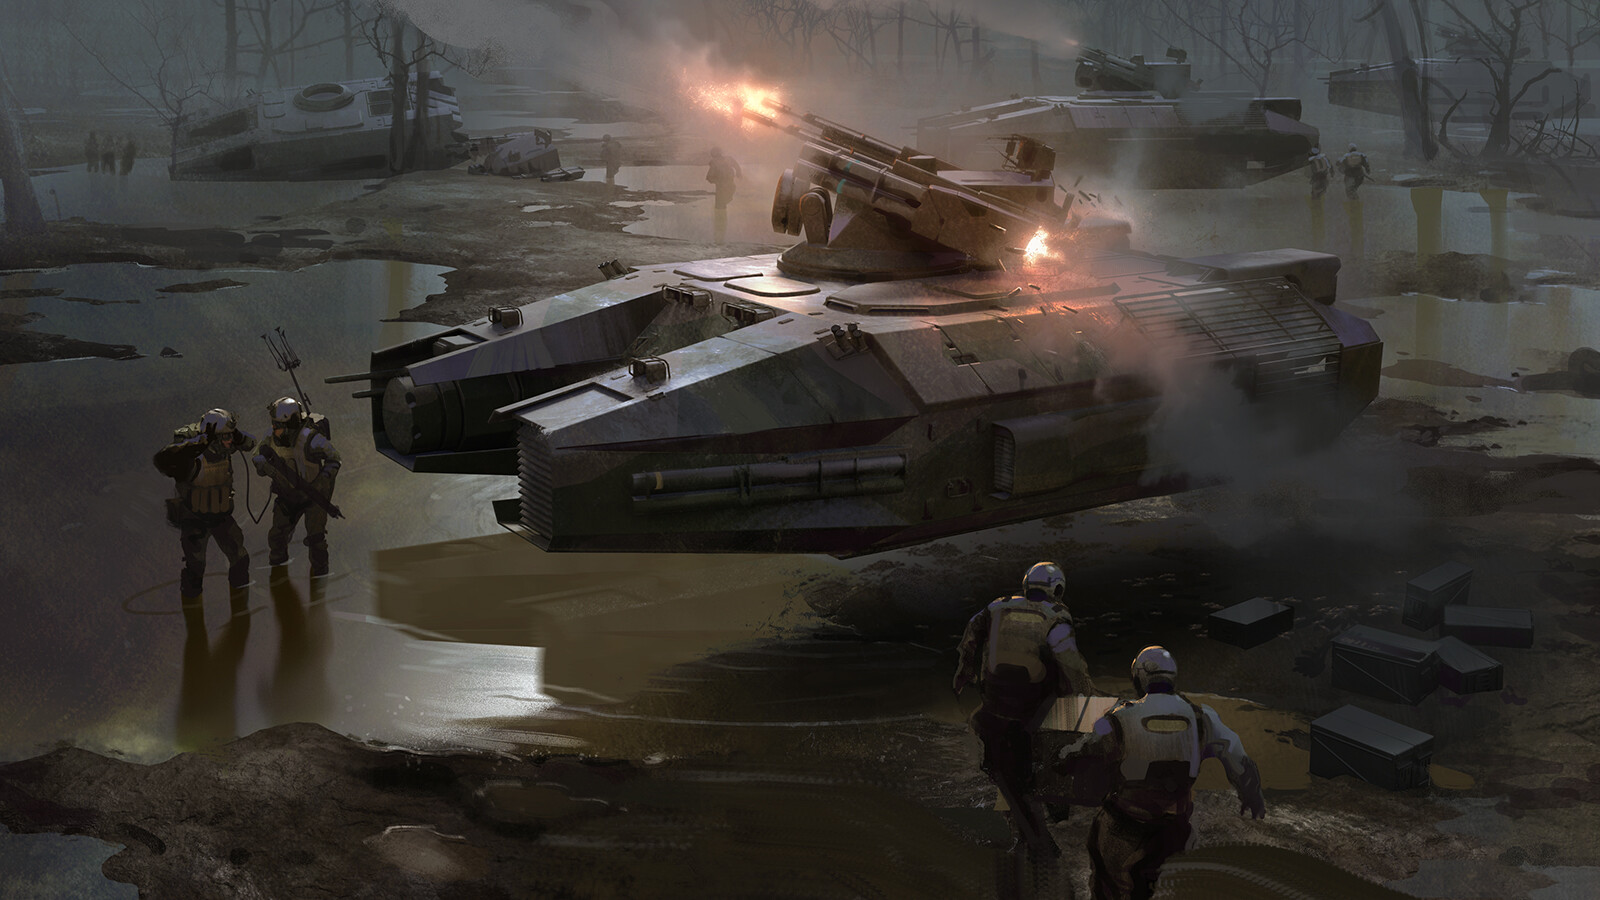 nick-gindraux-hover-tank-render2-artsati